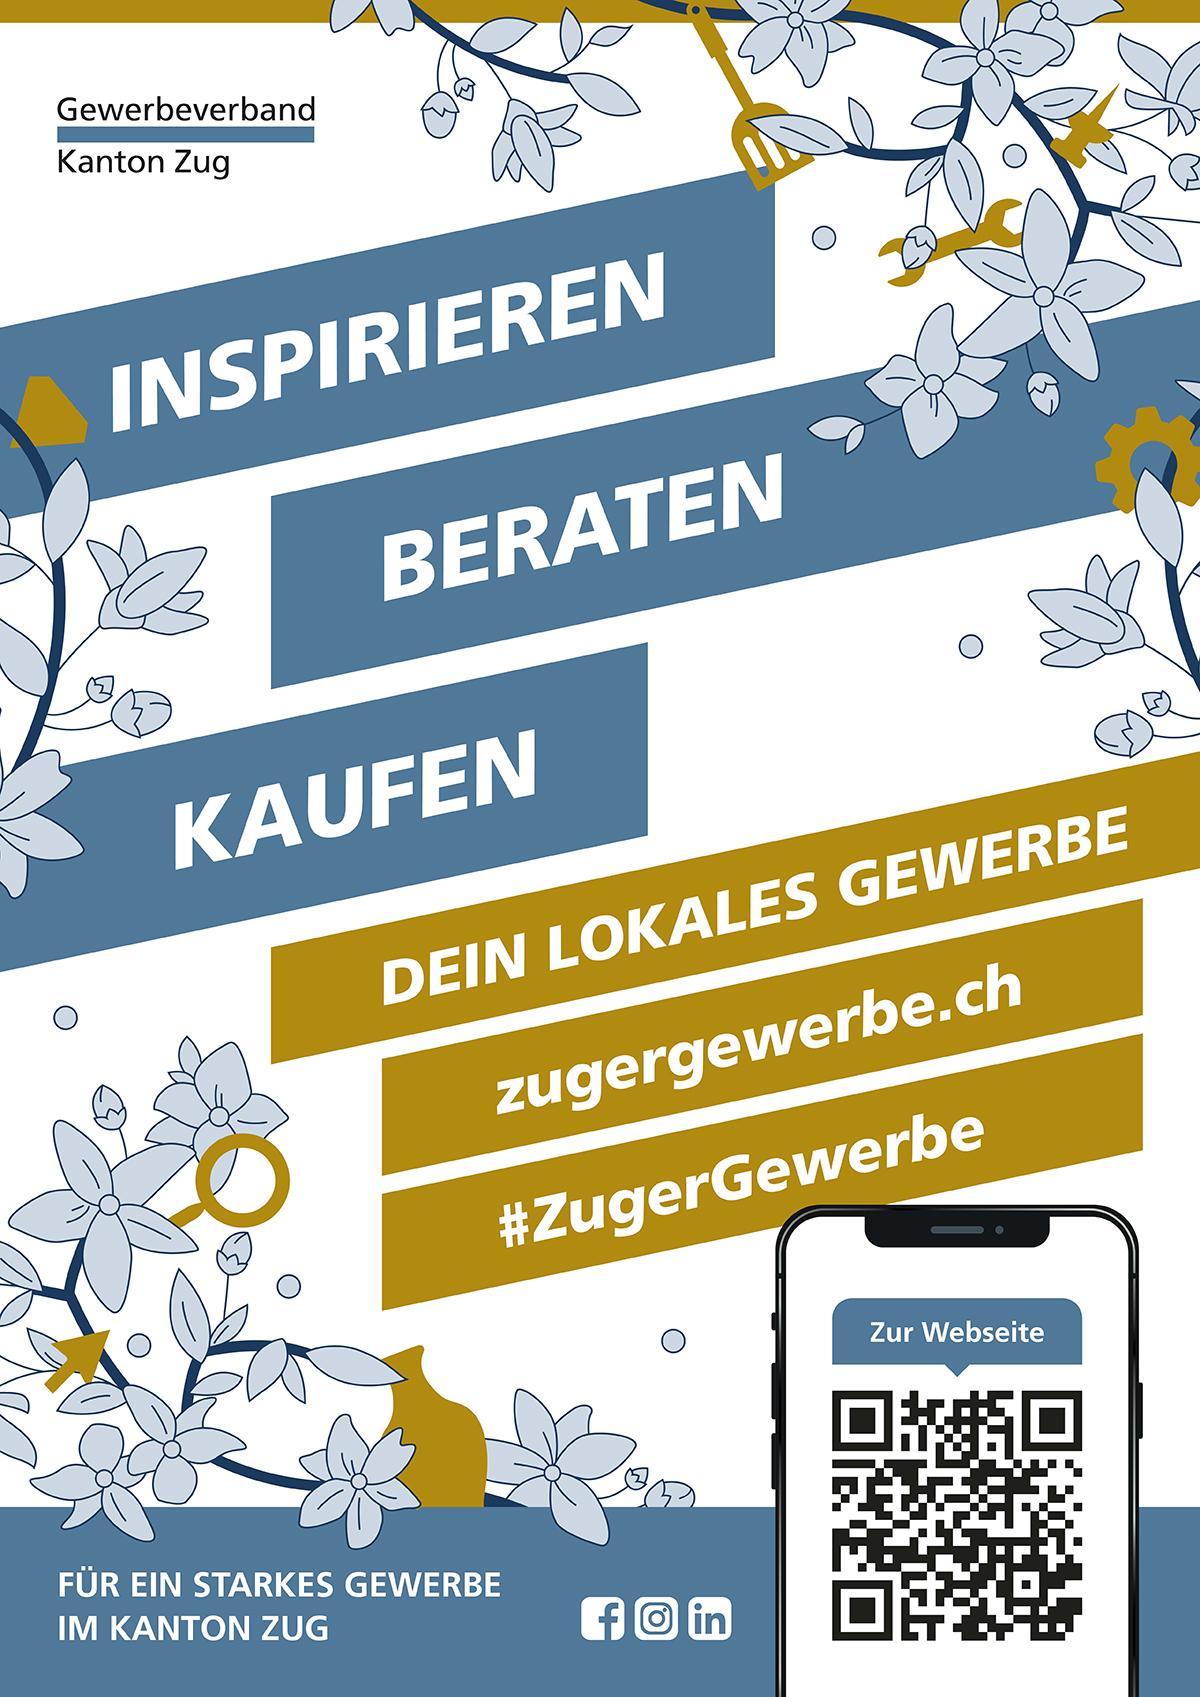 Gewerbeverband_Zug_Plakat